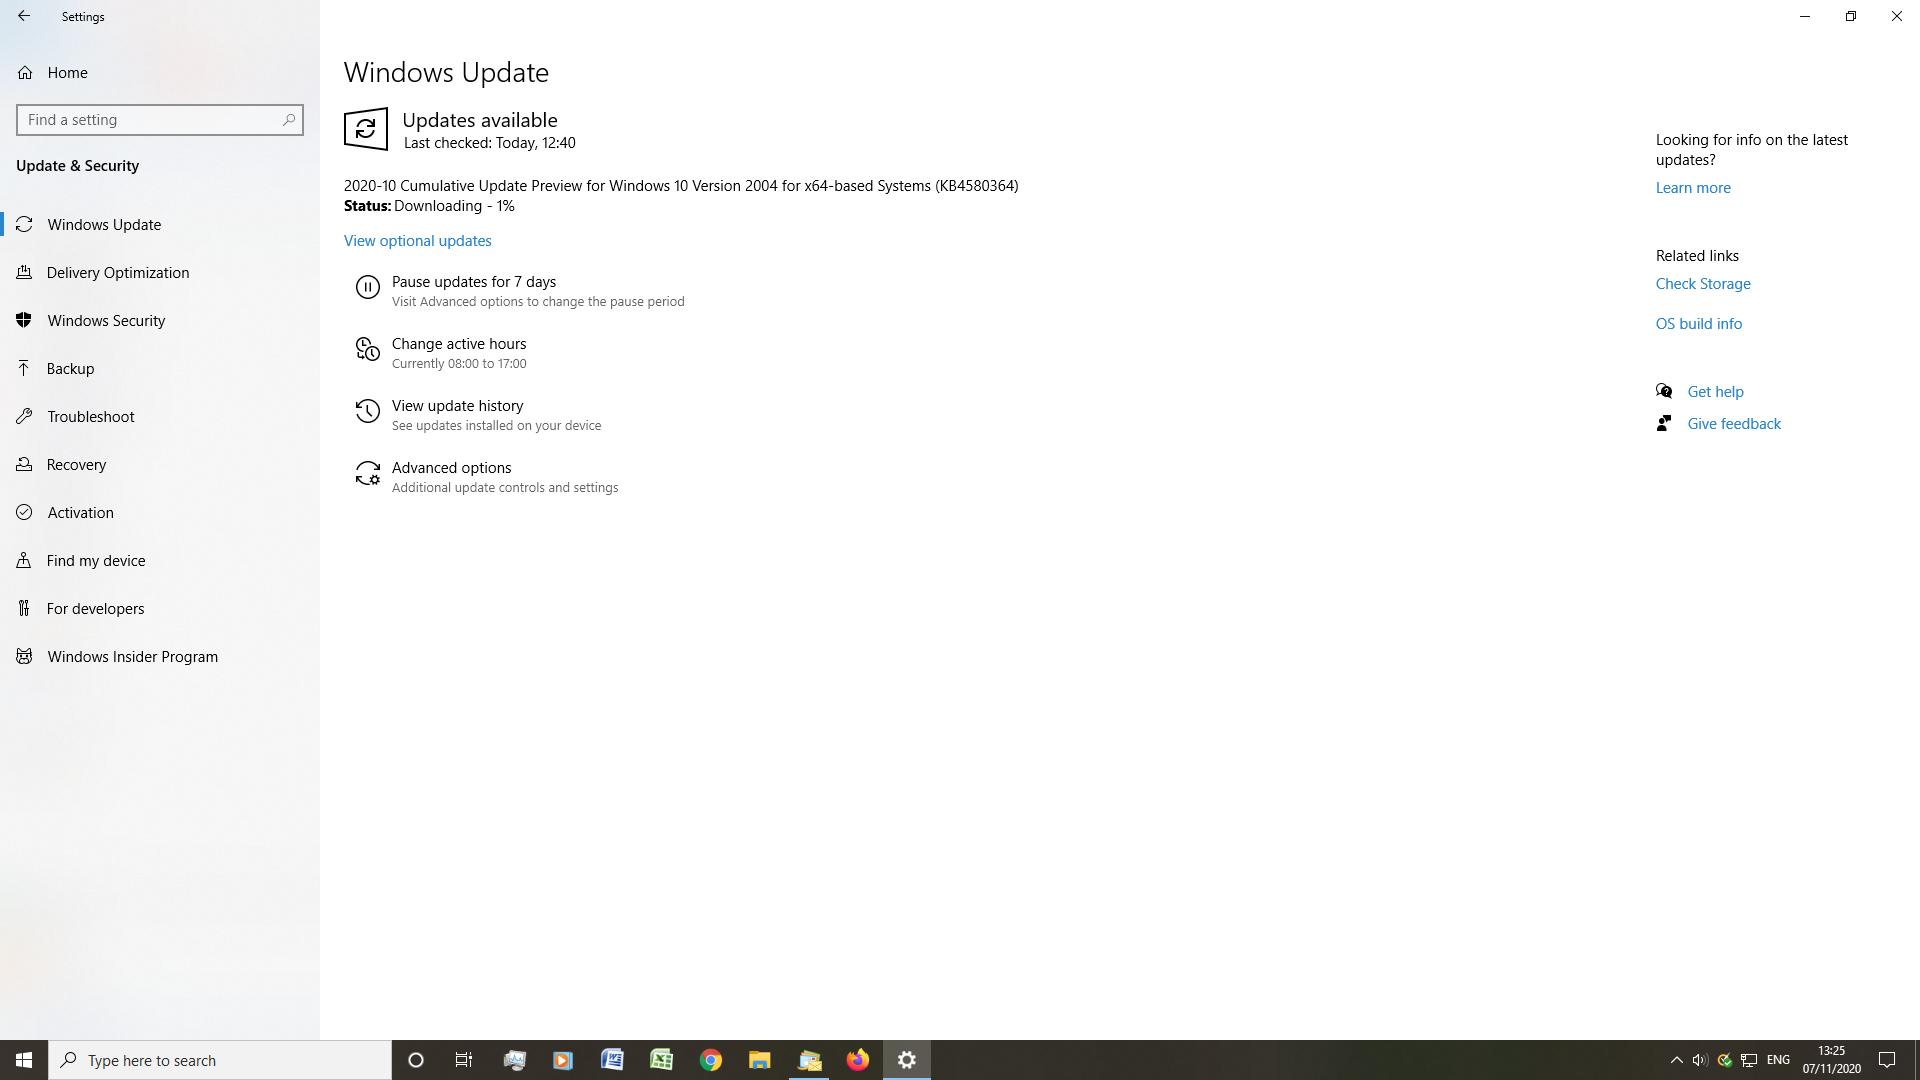 Windows Update Screen.png